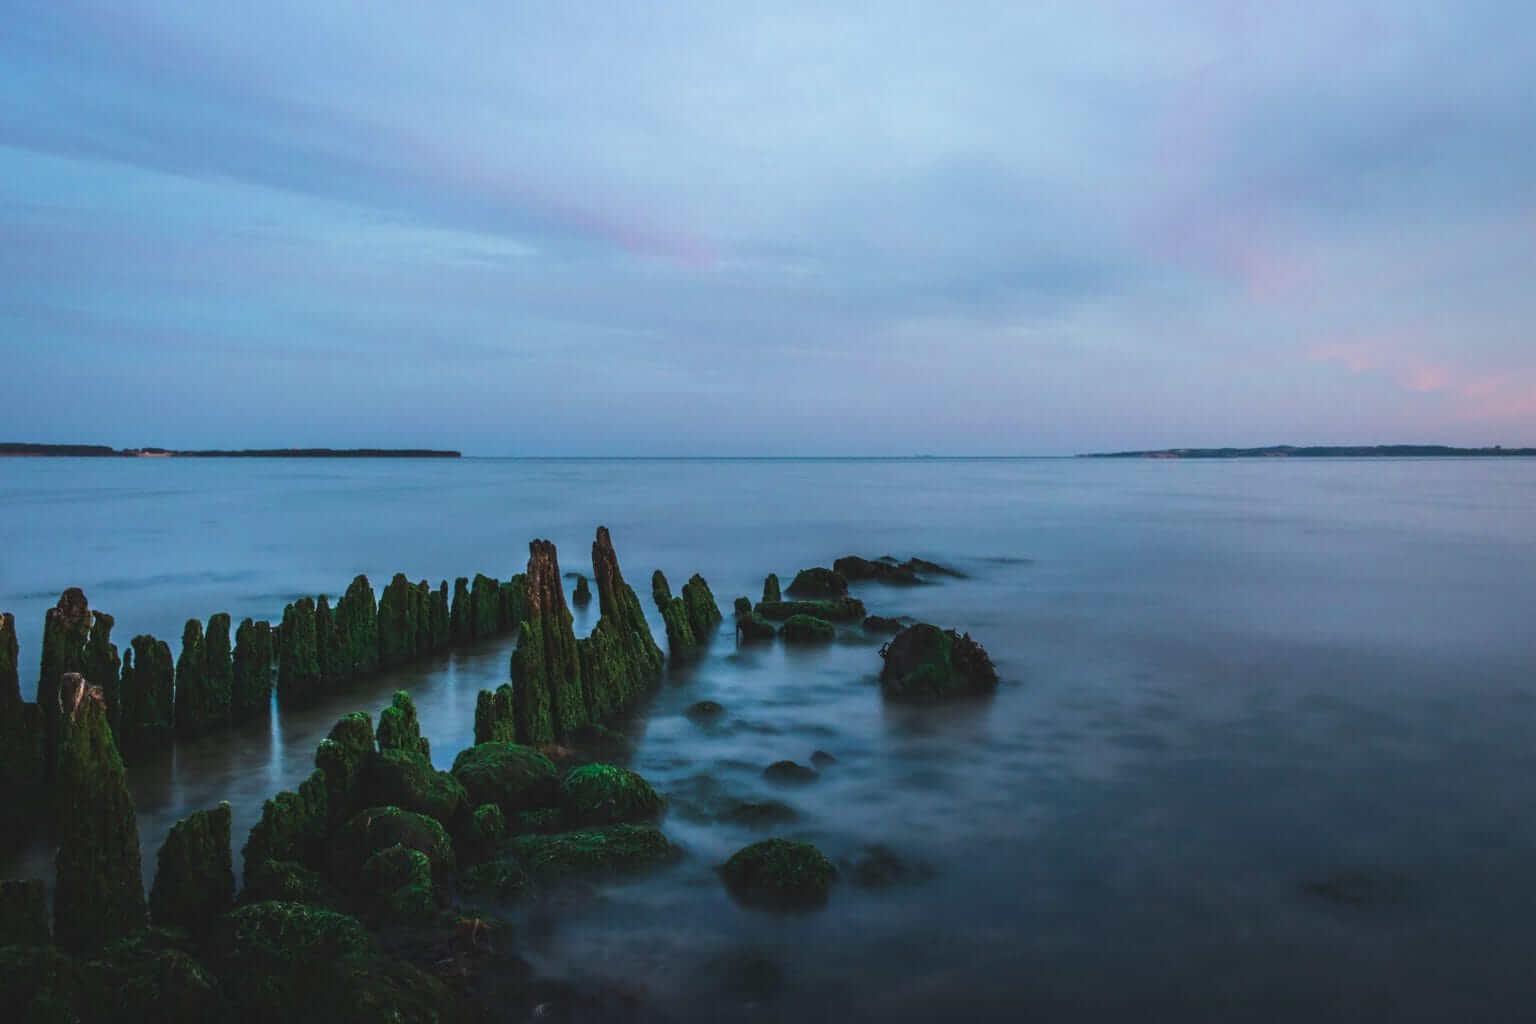 The Eroding Shore